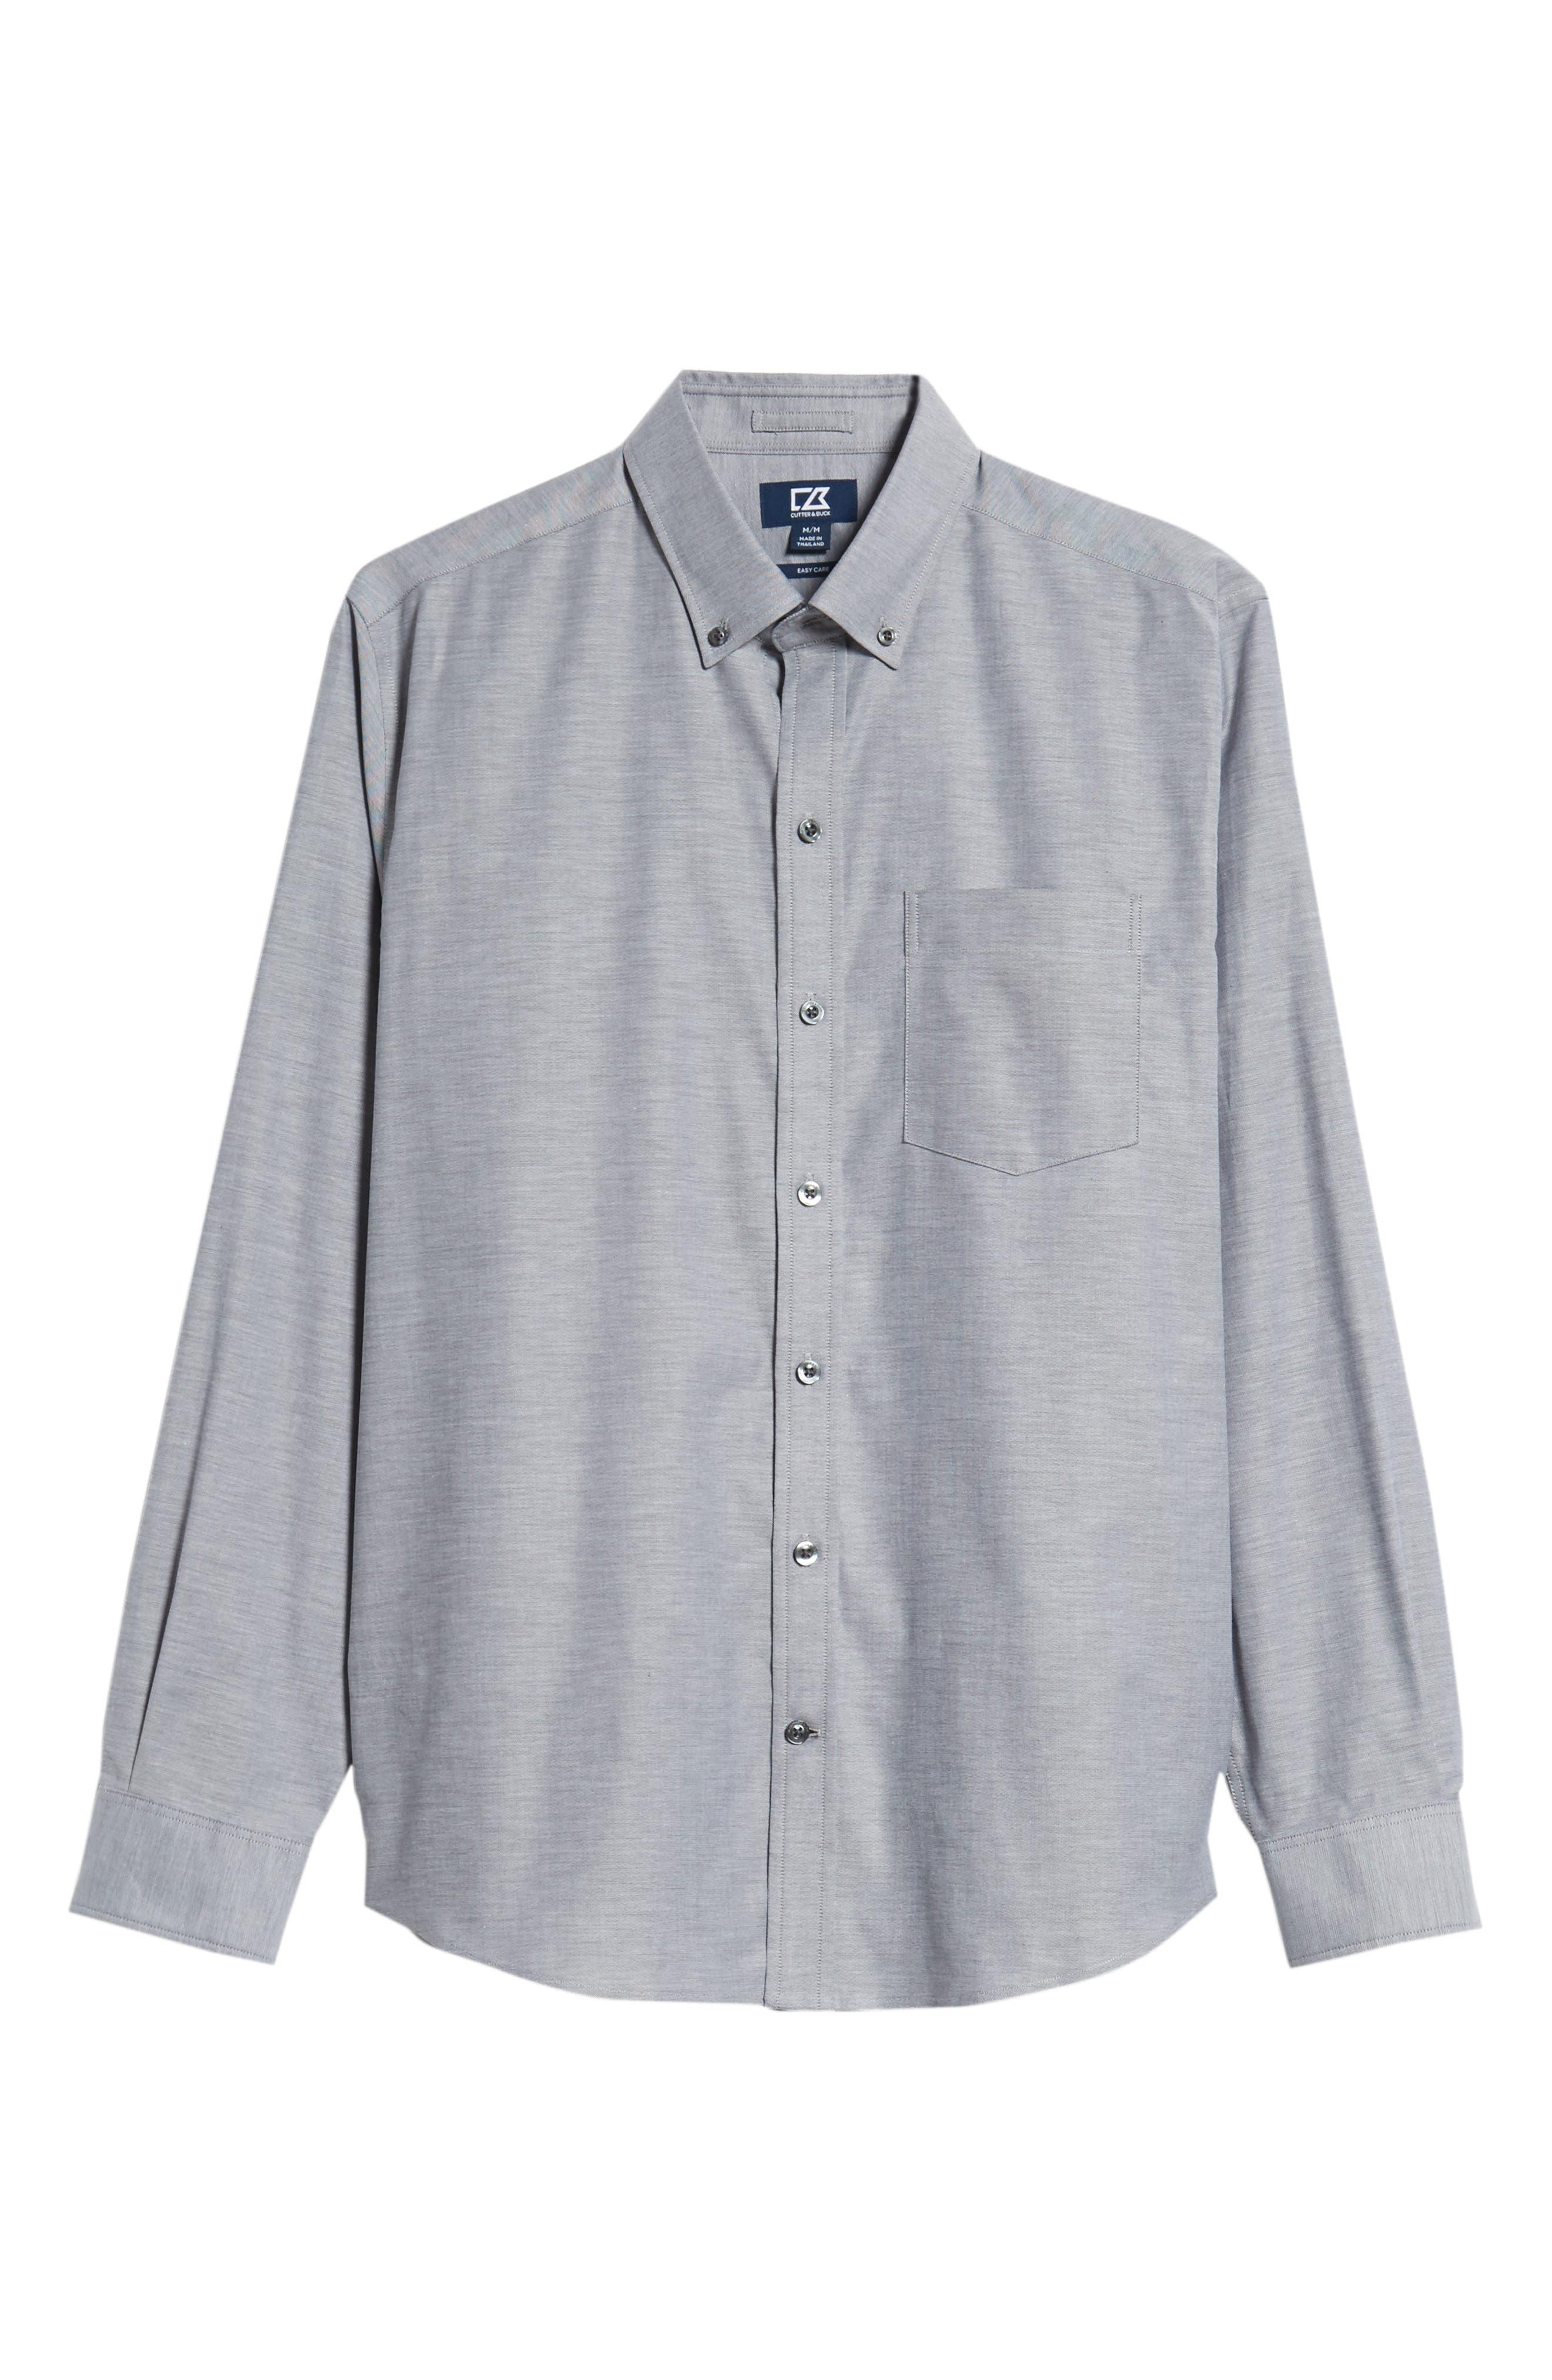 Tailor Regular Fit Oxford Sport Shirt,                             Alternate thumbnail 5, color,                             CHARCOAL 2